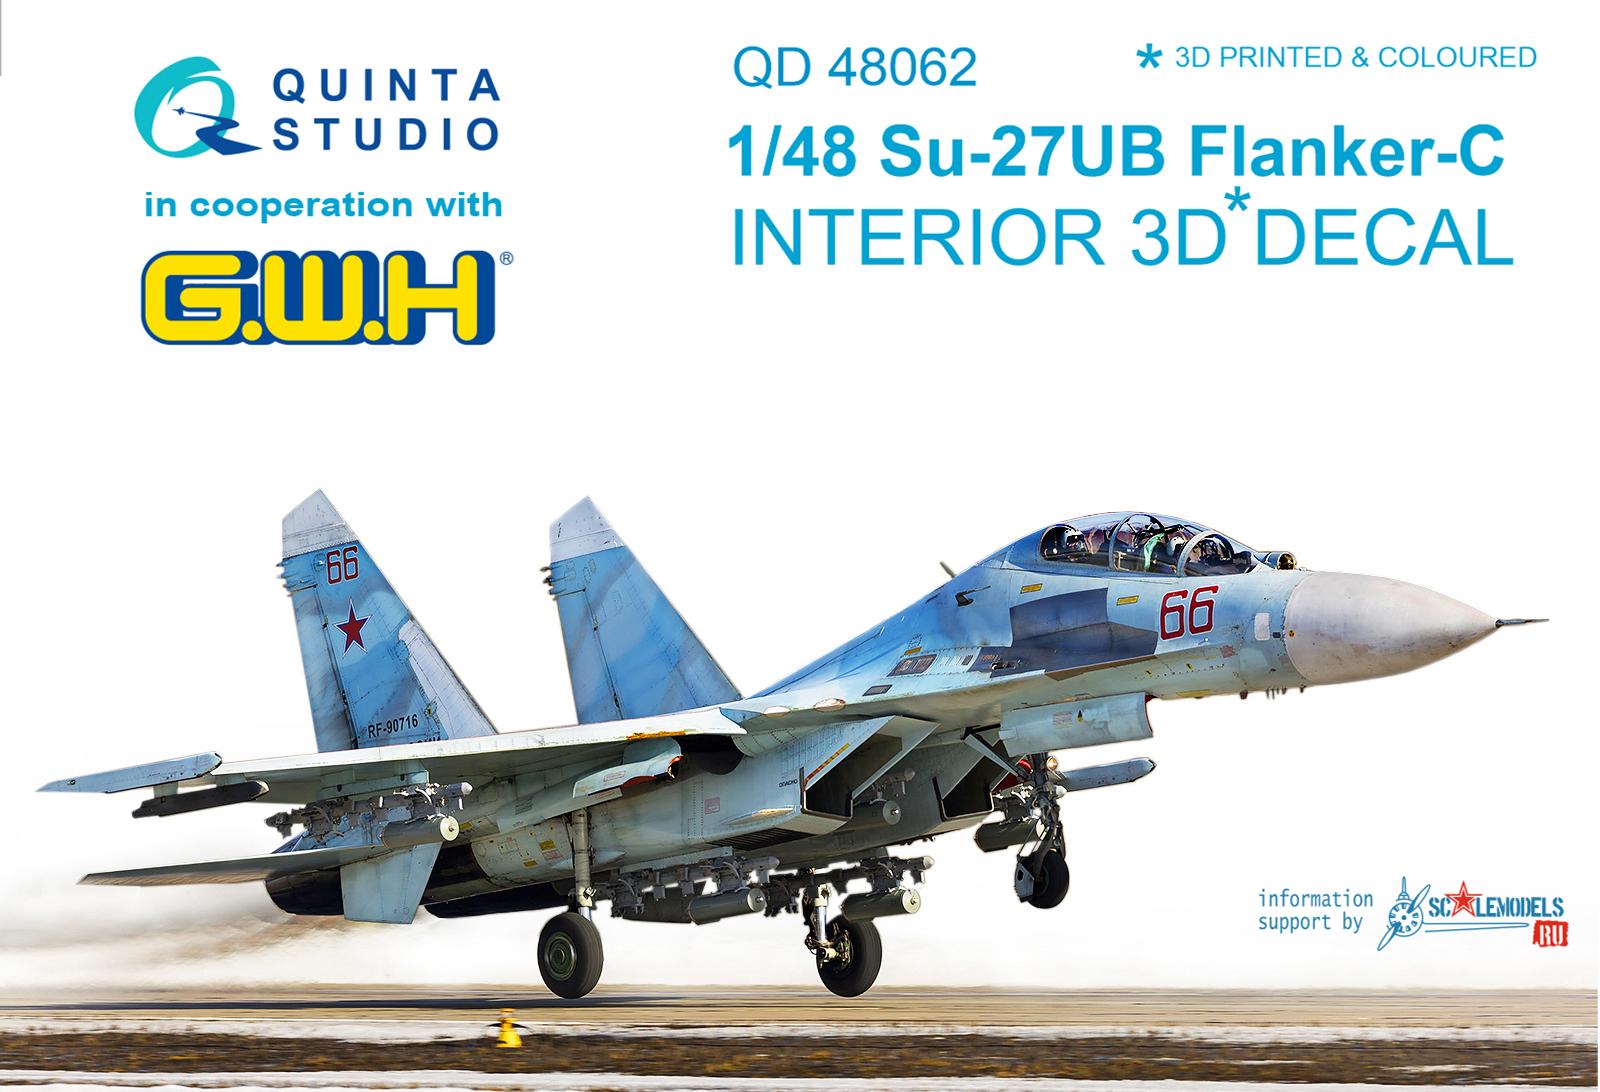 QD48062